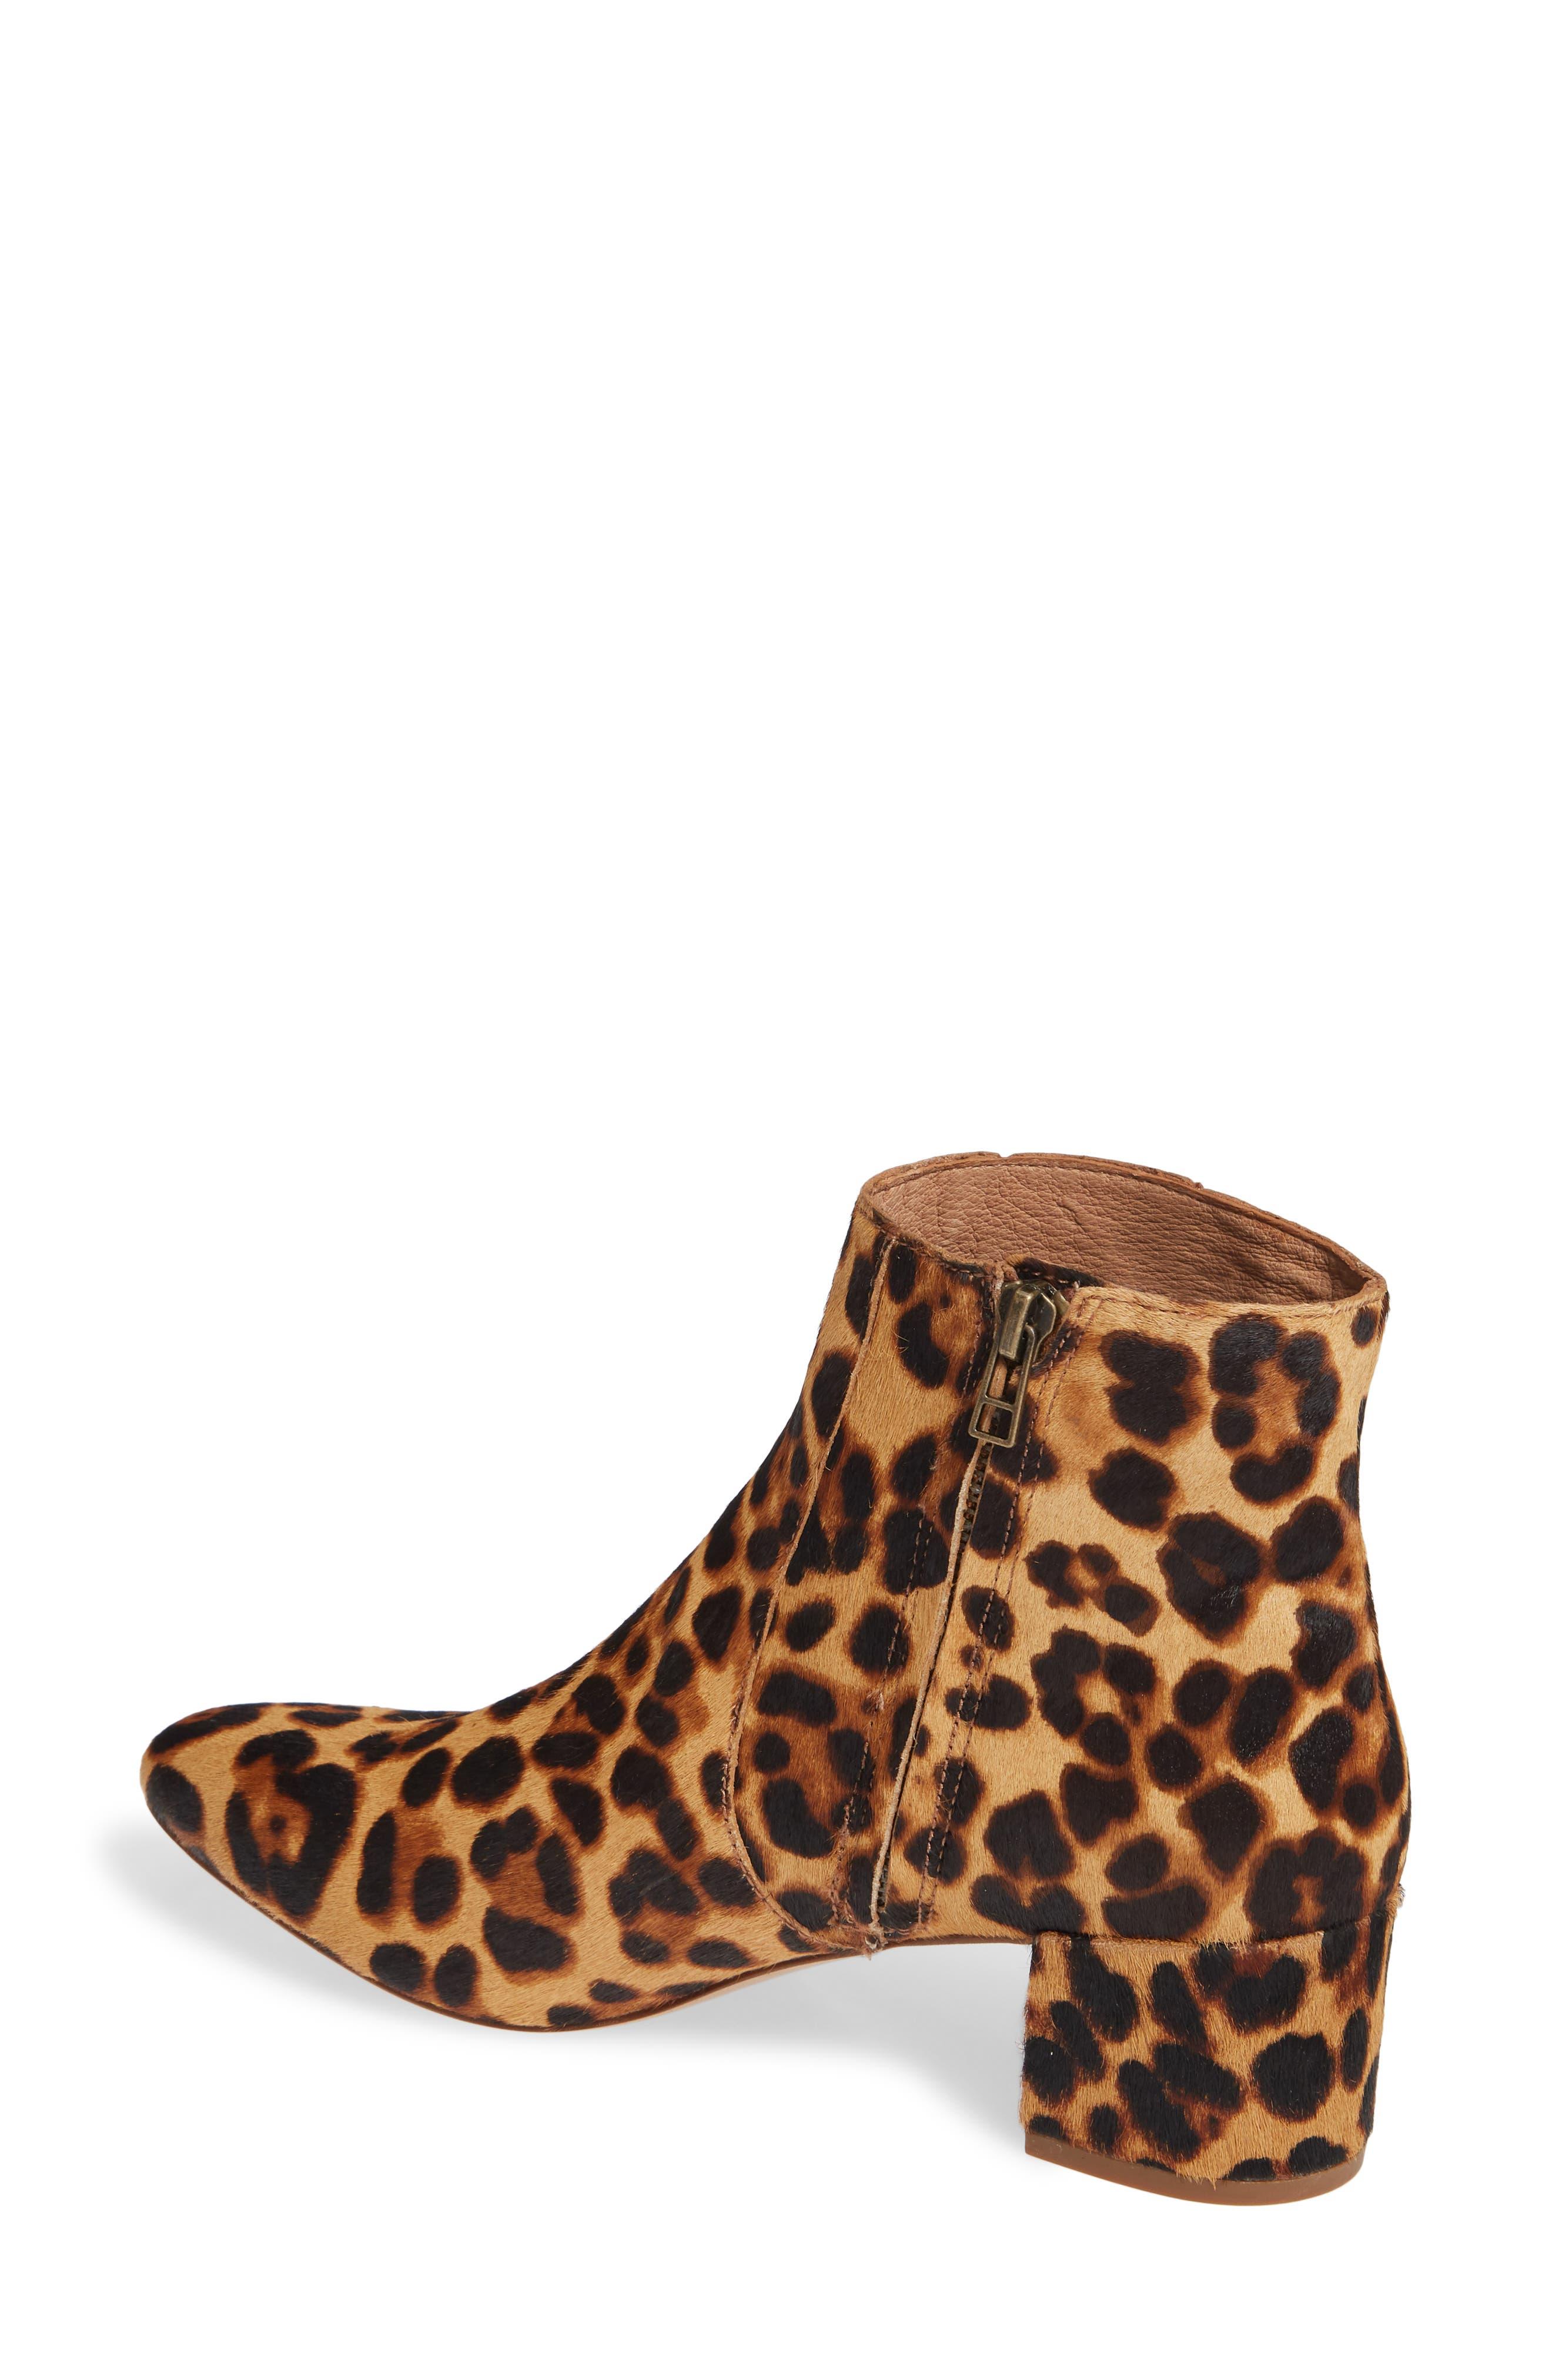 MADEWELL, The Jada Genuine Calf Hair Boot, Alternate thumbnail 2, color, 200